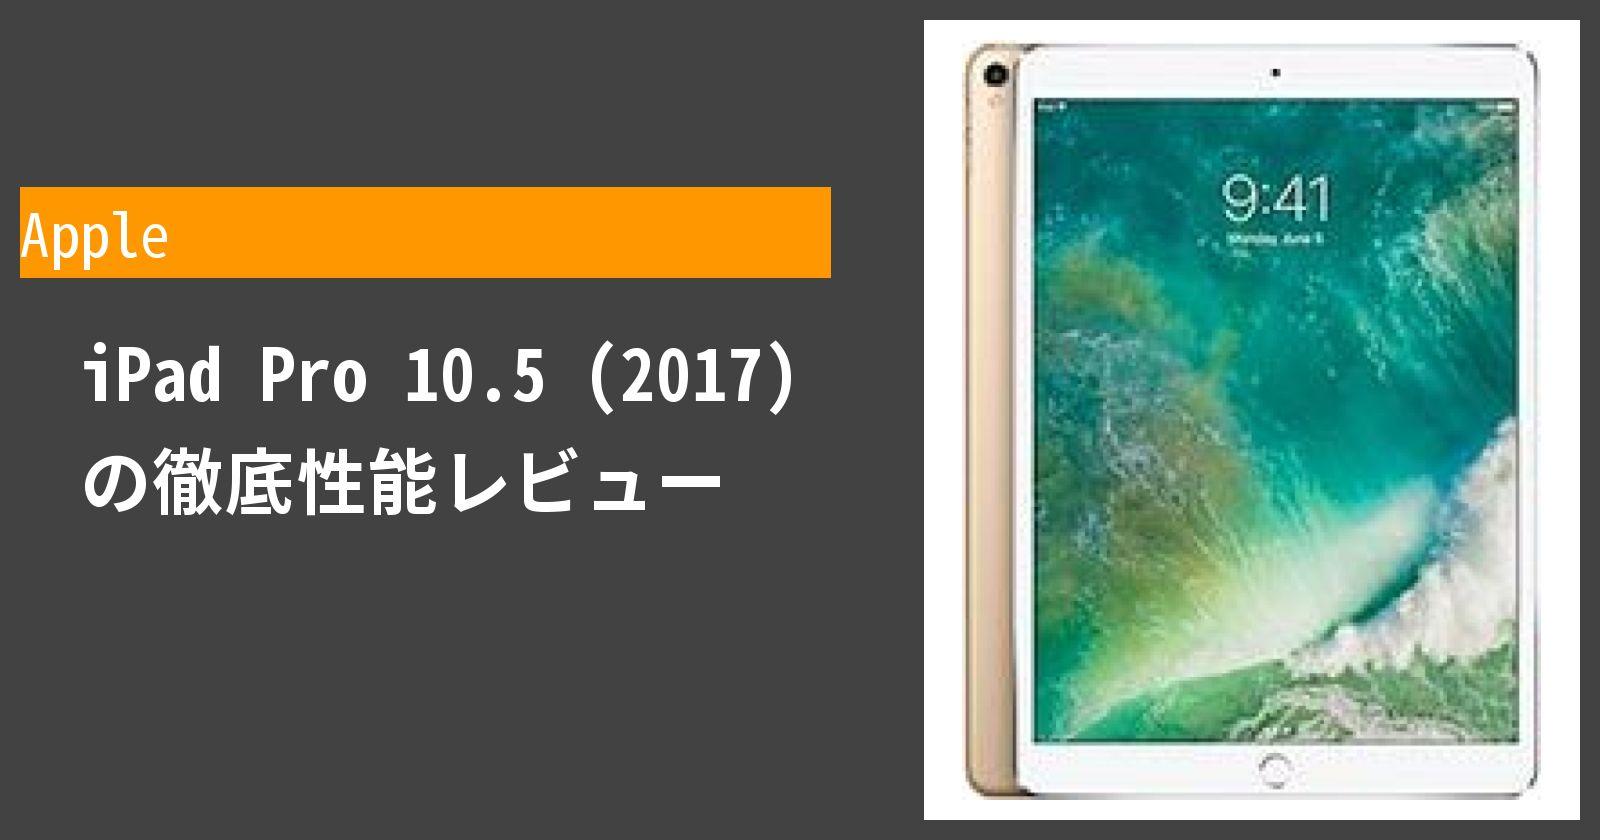 iPad Pro 10.5 (2017) の徹底性能レビュー